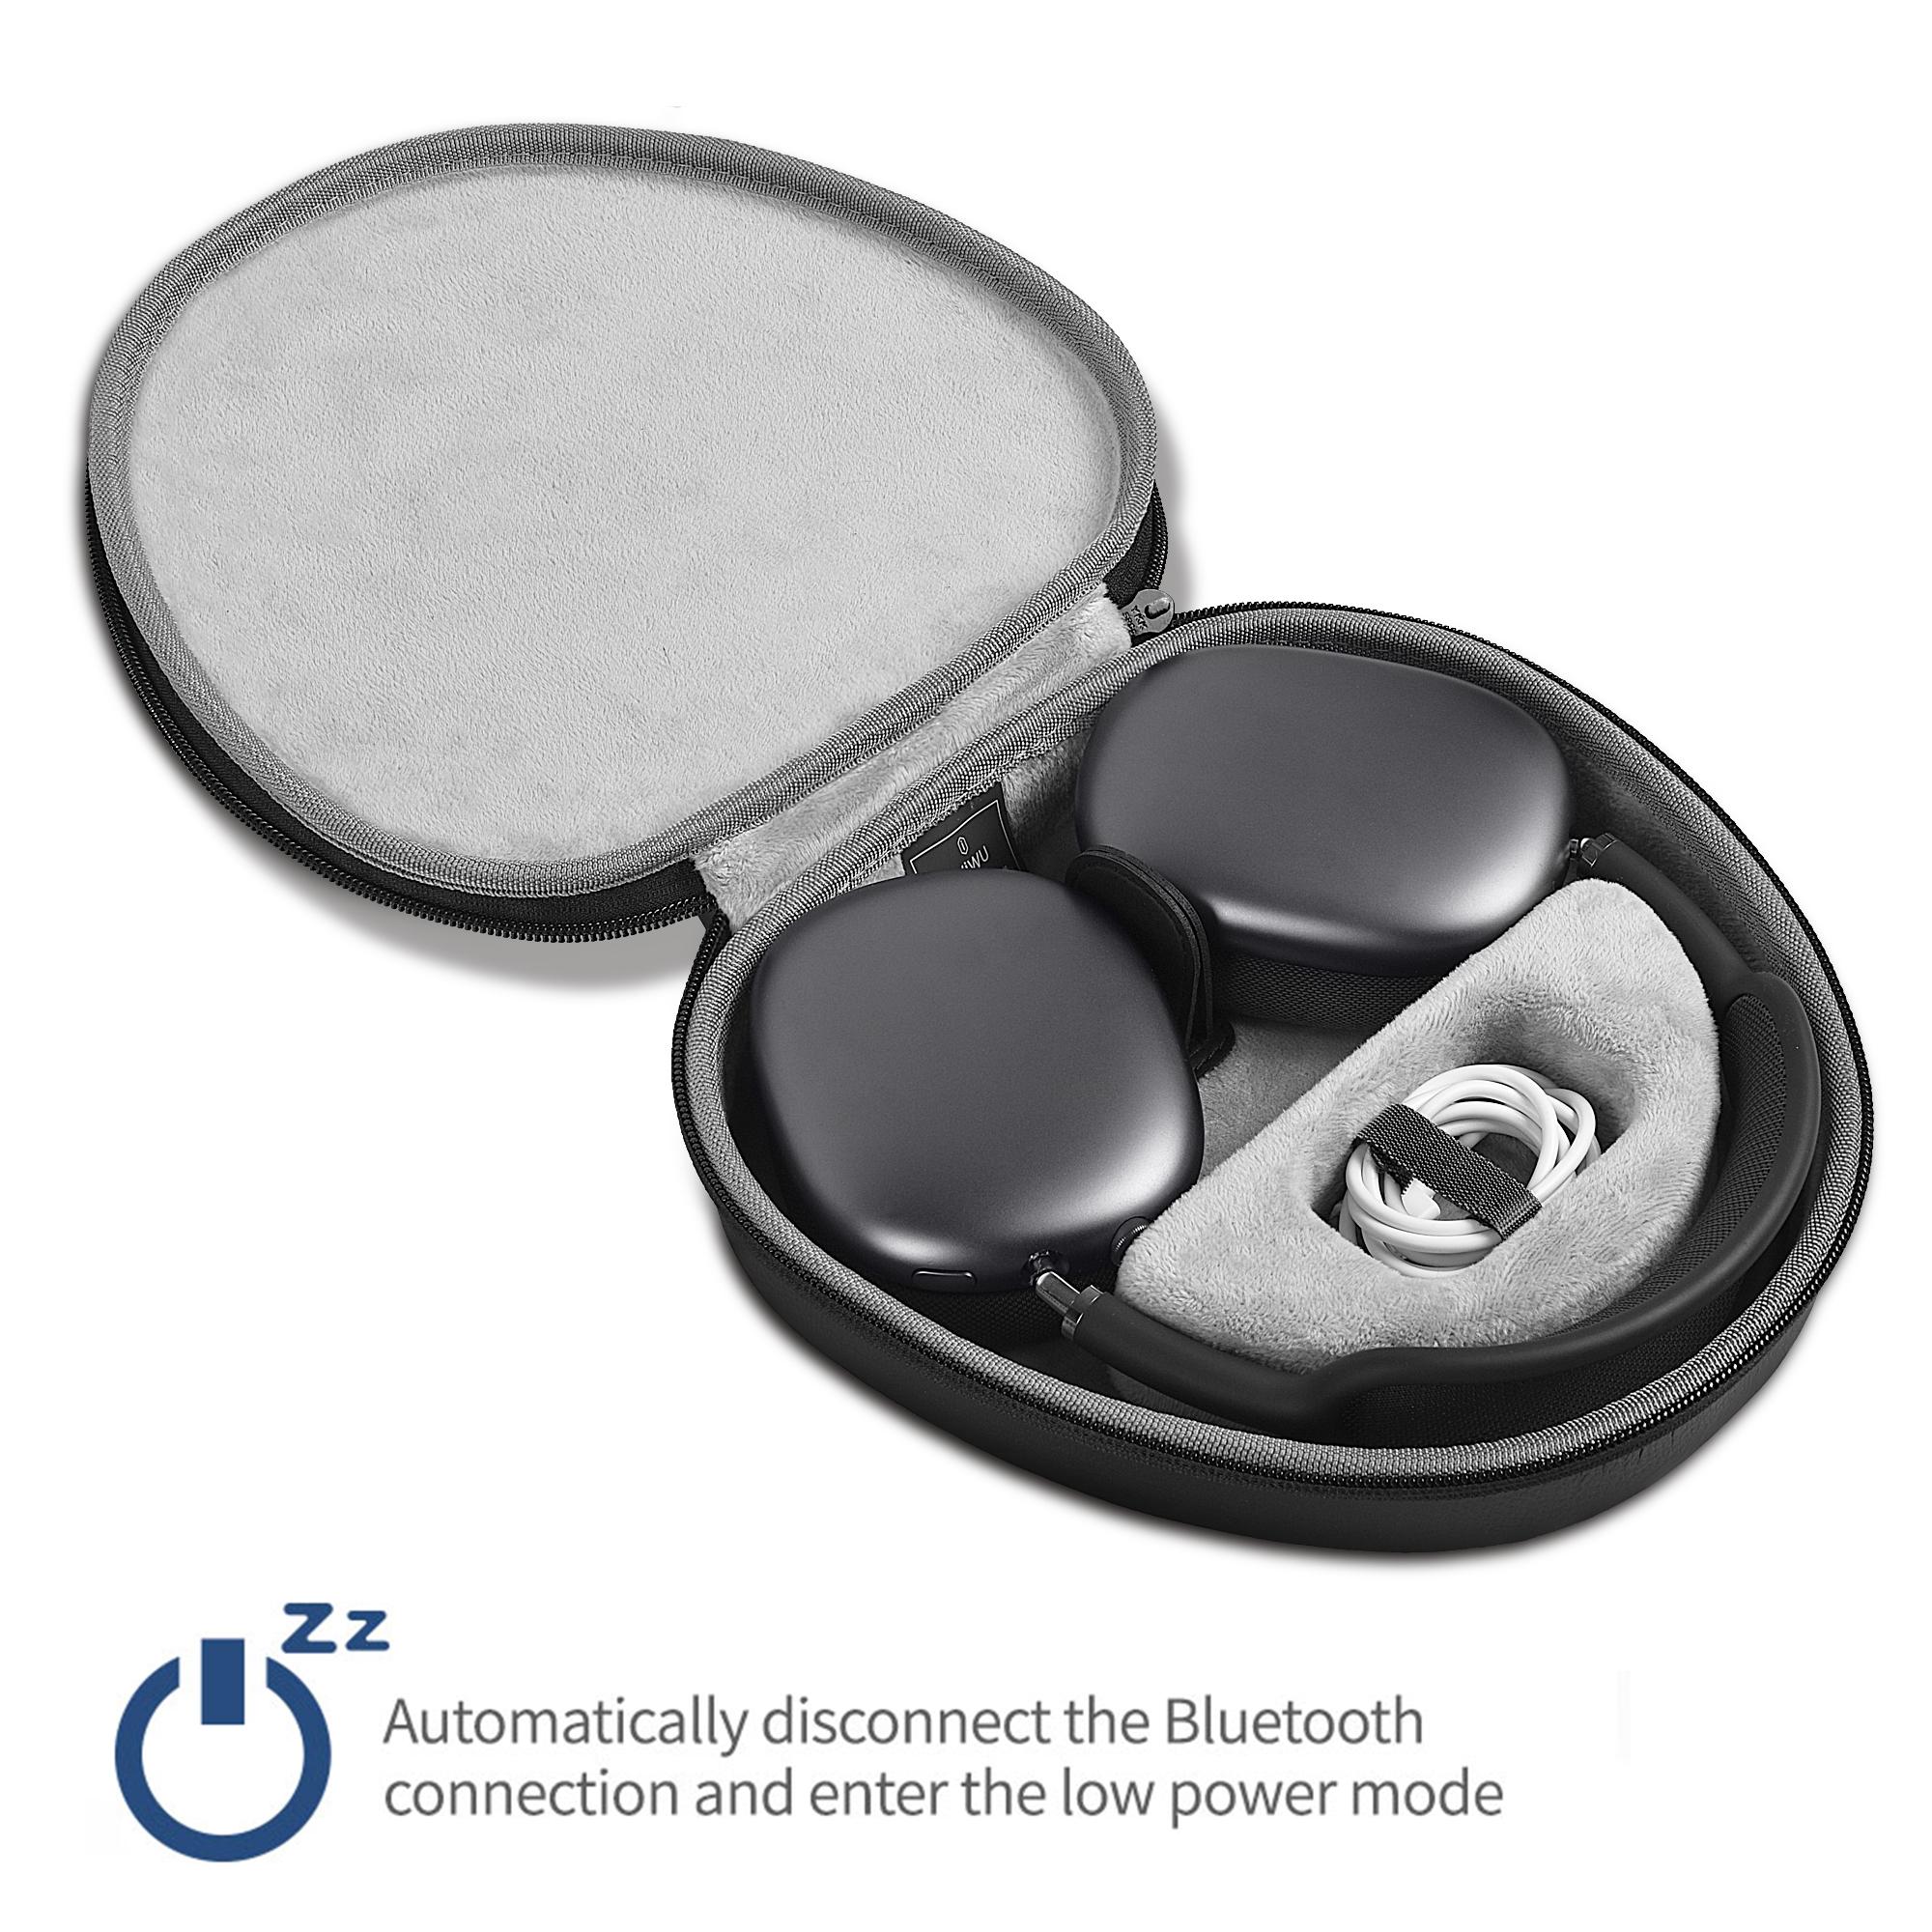 WiWU 适用于Airpod Max智能耳机套 (https://www.wiwu.net.cn/) AirPods 保护壳 第4张